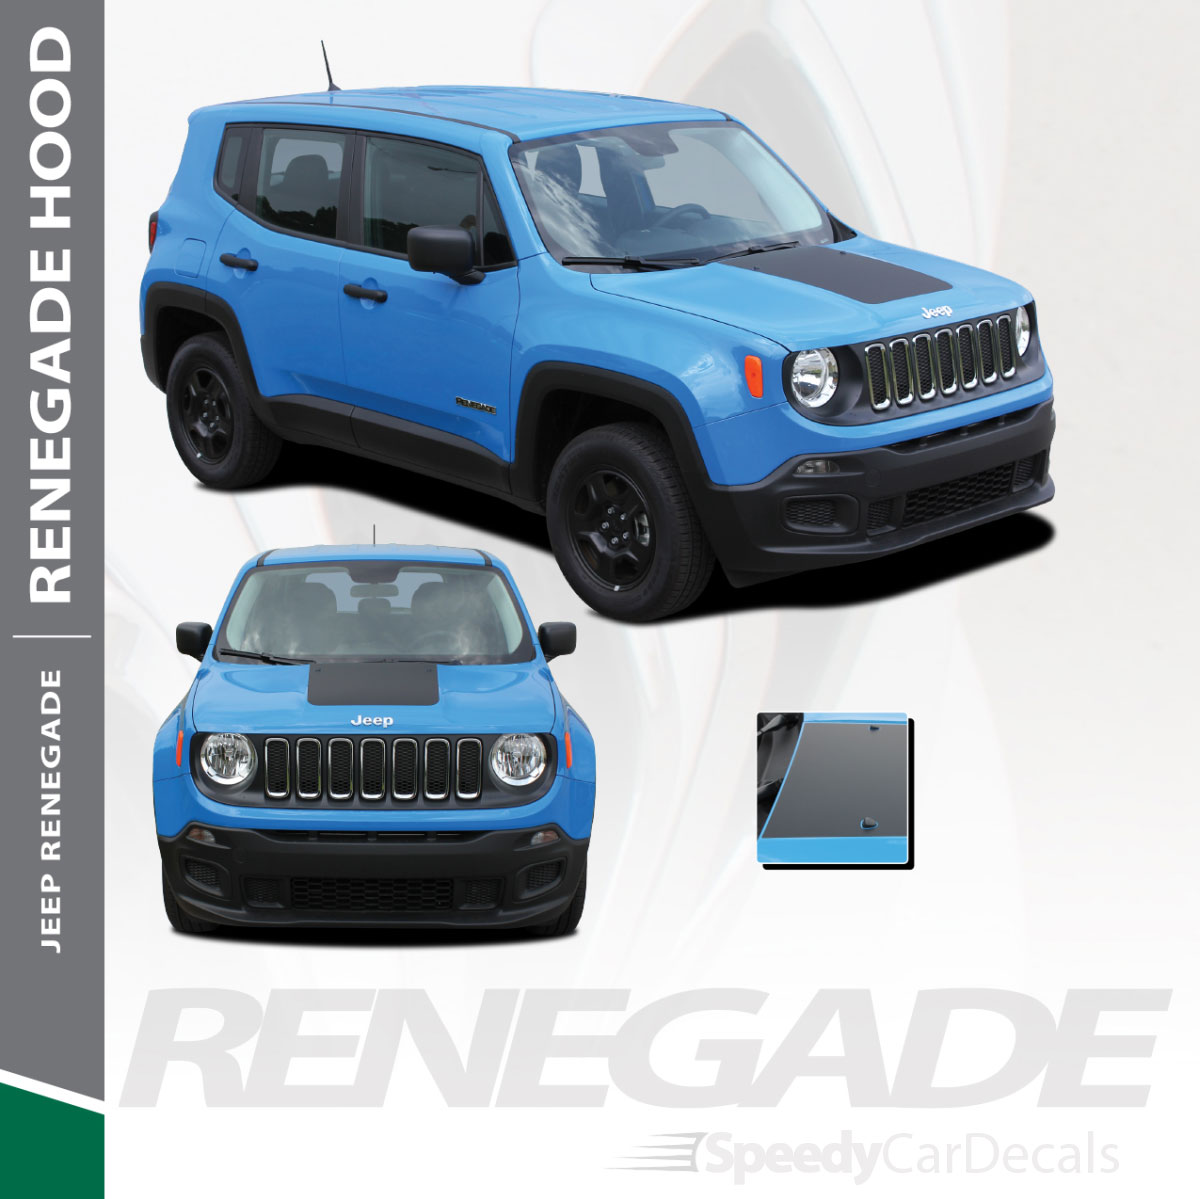 495 Stickers Decals Vehicle Graphics Car Graphics Vehicle Vinyl  Graphics